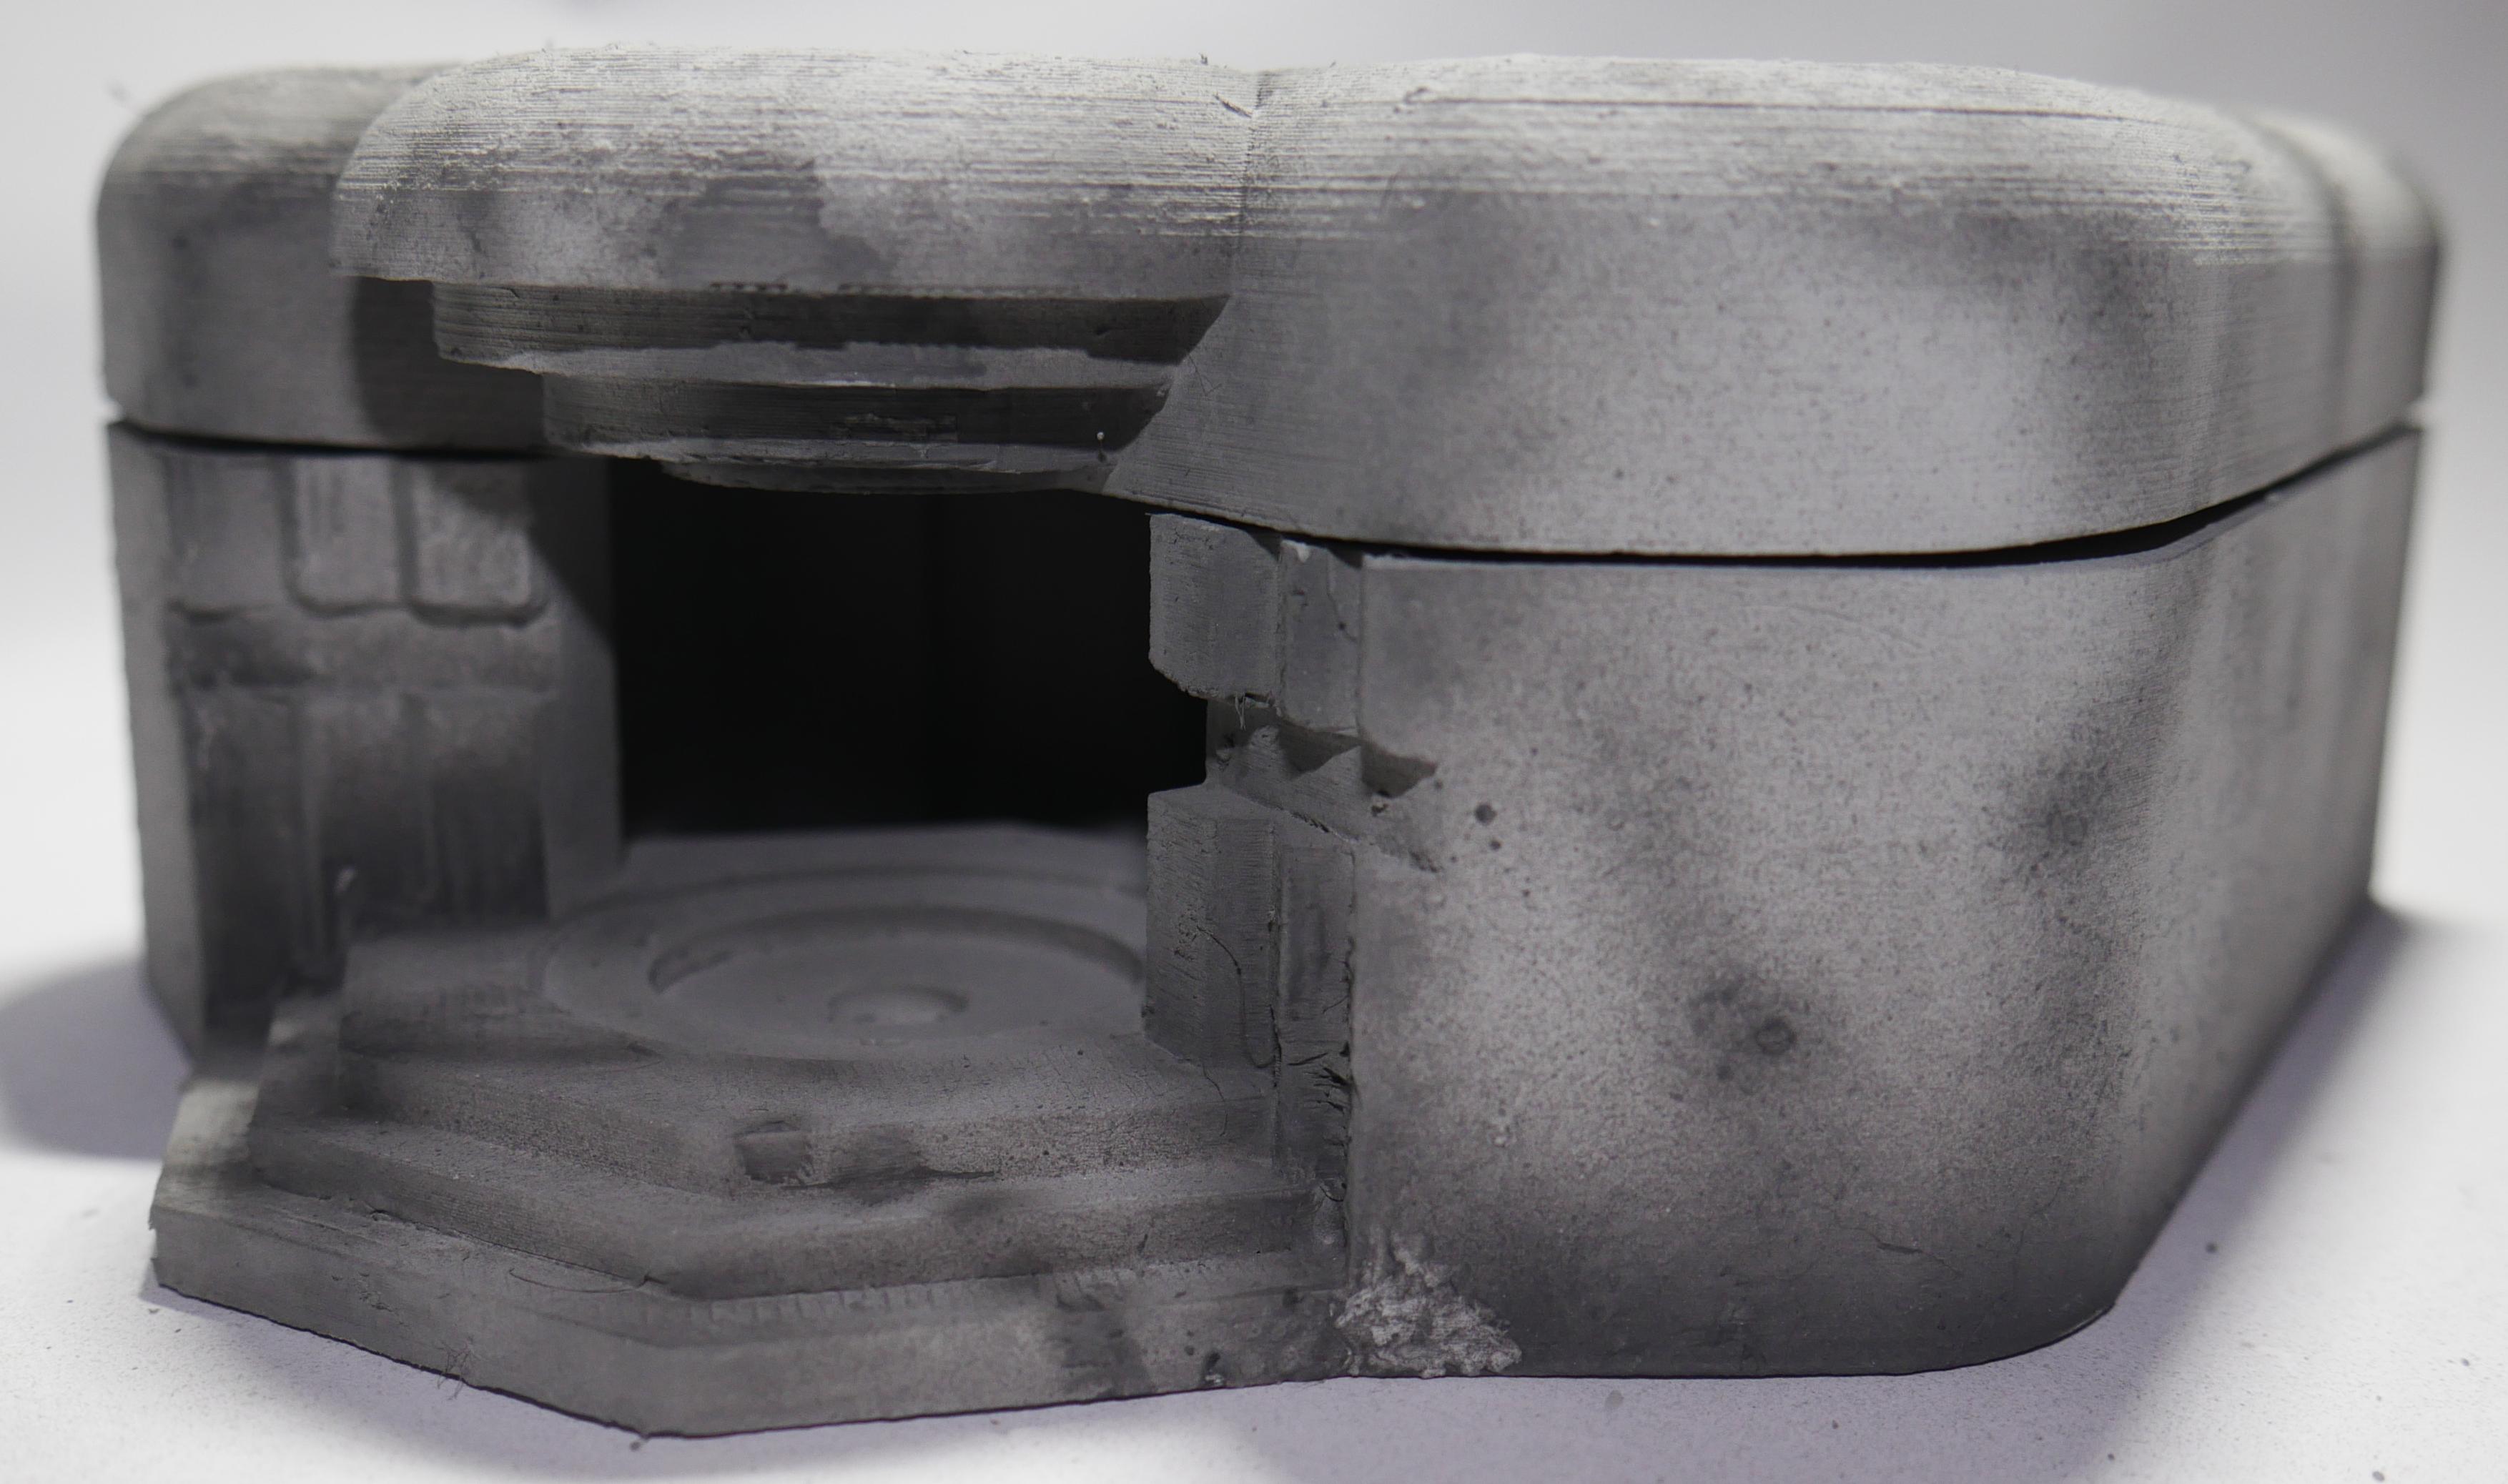 WWII German Normandy bunker Model Railway OO HO Gauge Scale 1:87, Regelbau M272